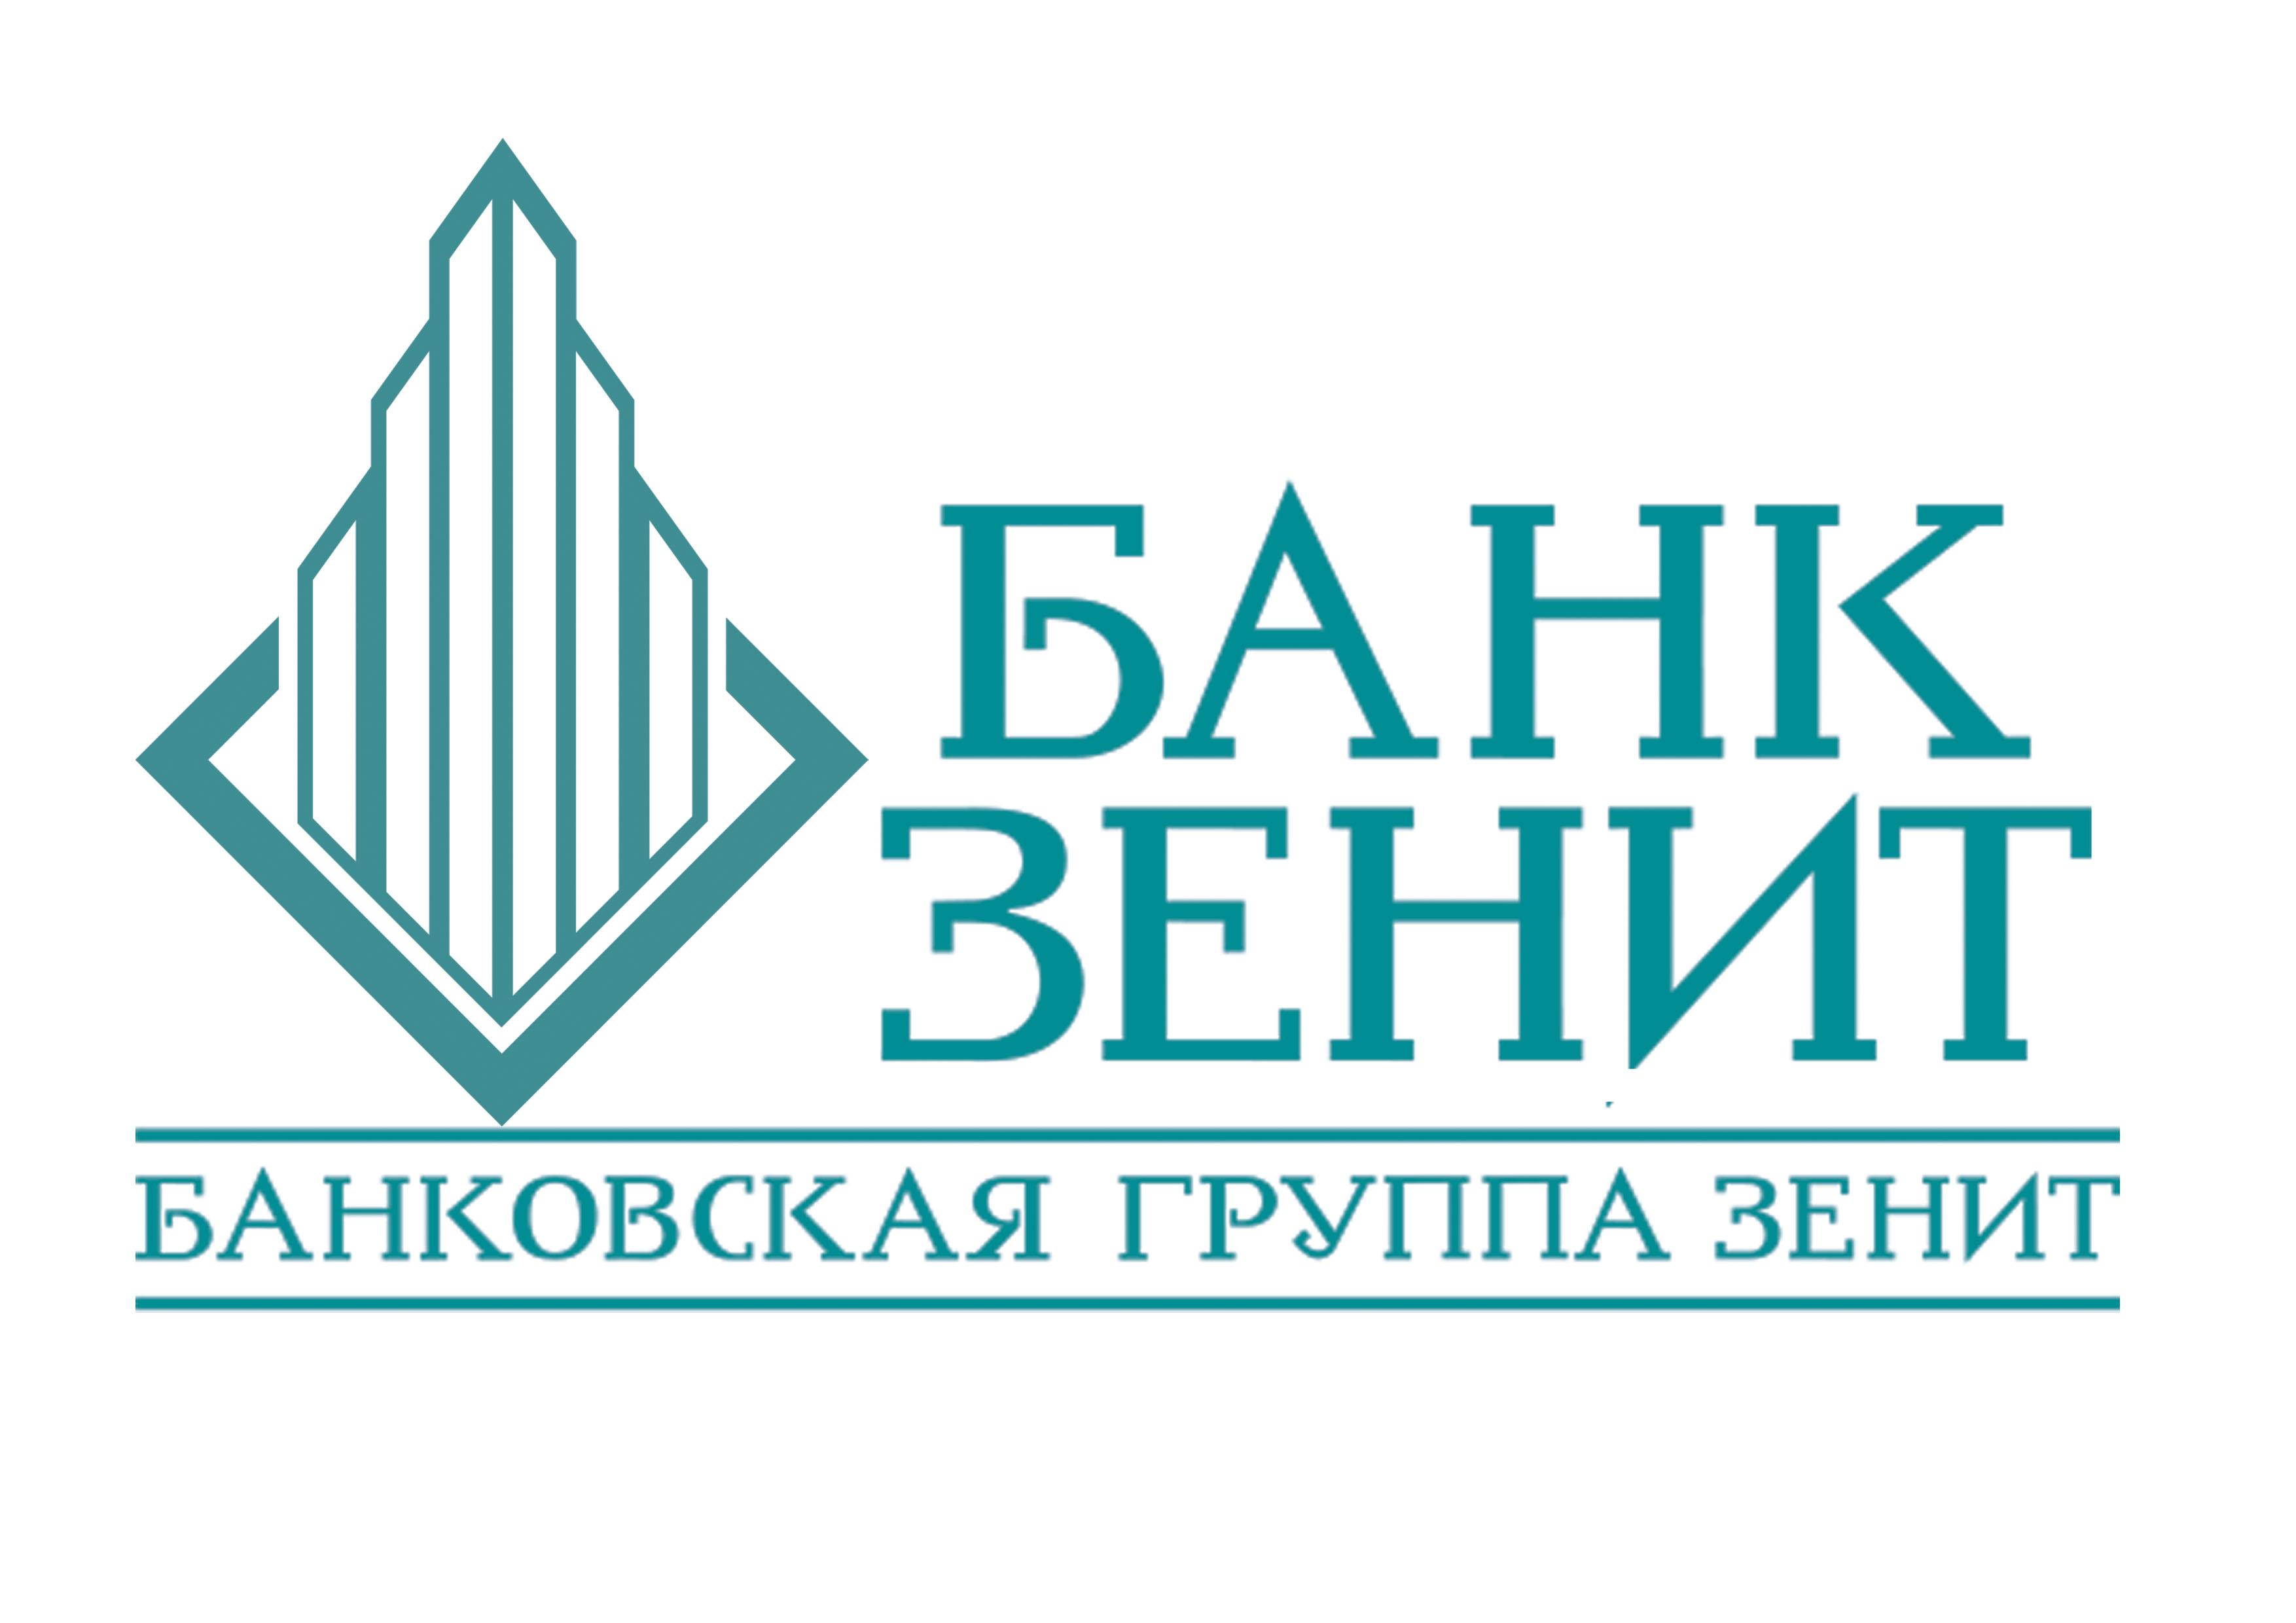 Разработка логотипа для Банка ЗЕНИТ фото f_4775b50f2116151b.jpg